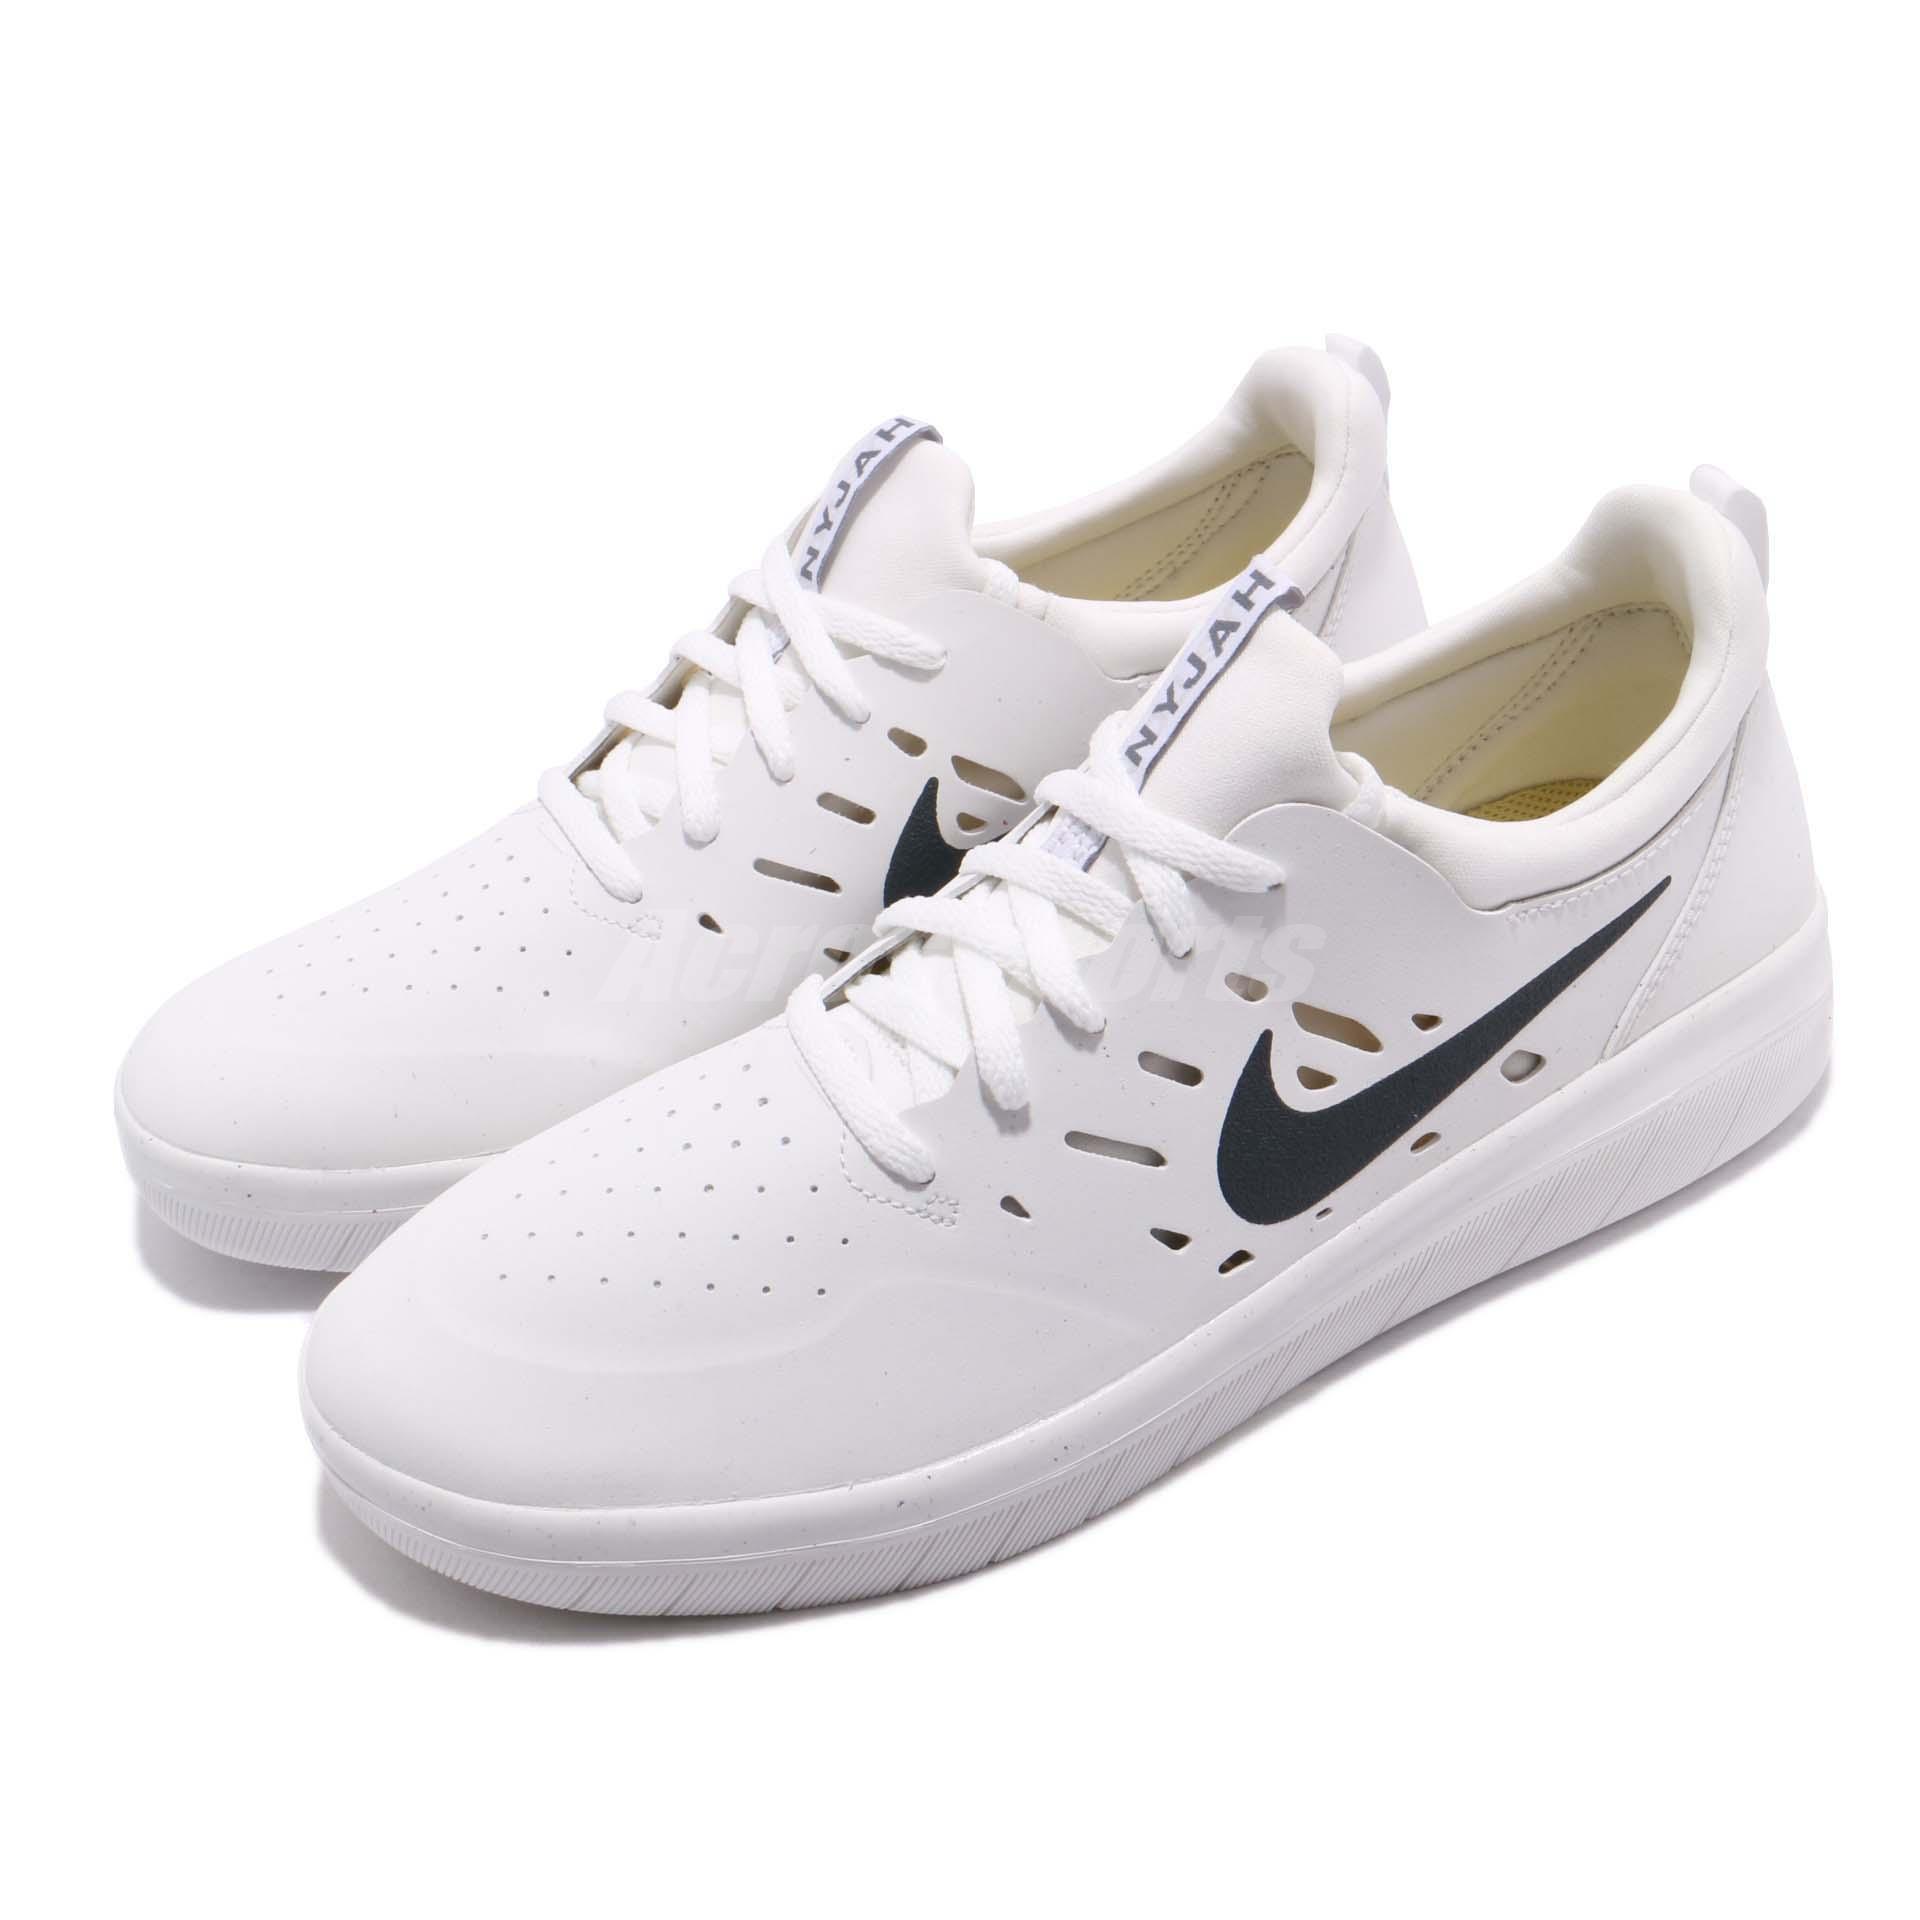 29b3a33dd94ed Nike SB Nyjah Free Huston White Til Death Men Skateboarding Shoes ...